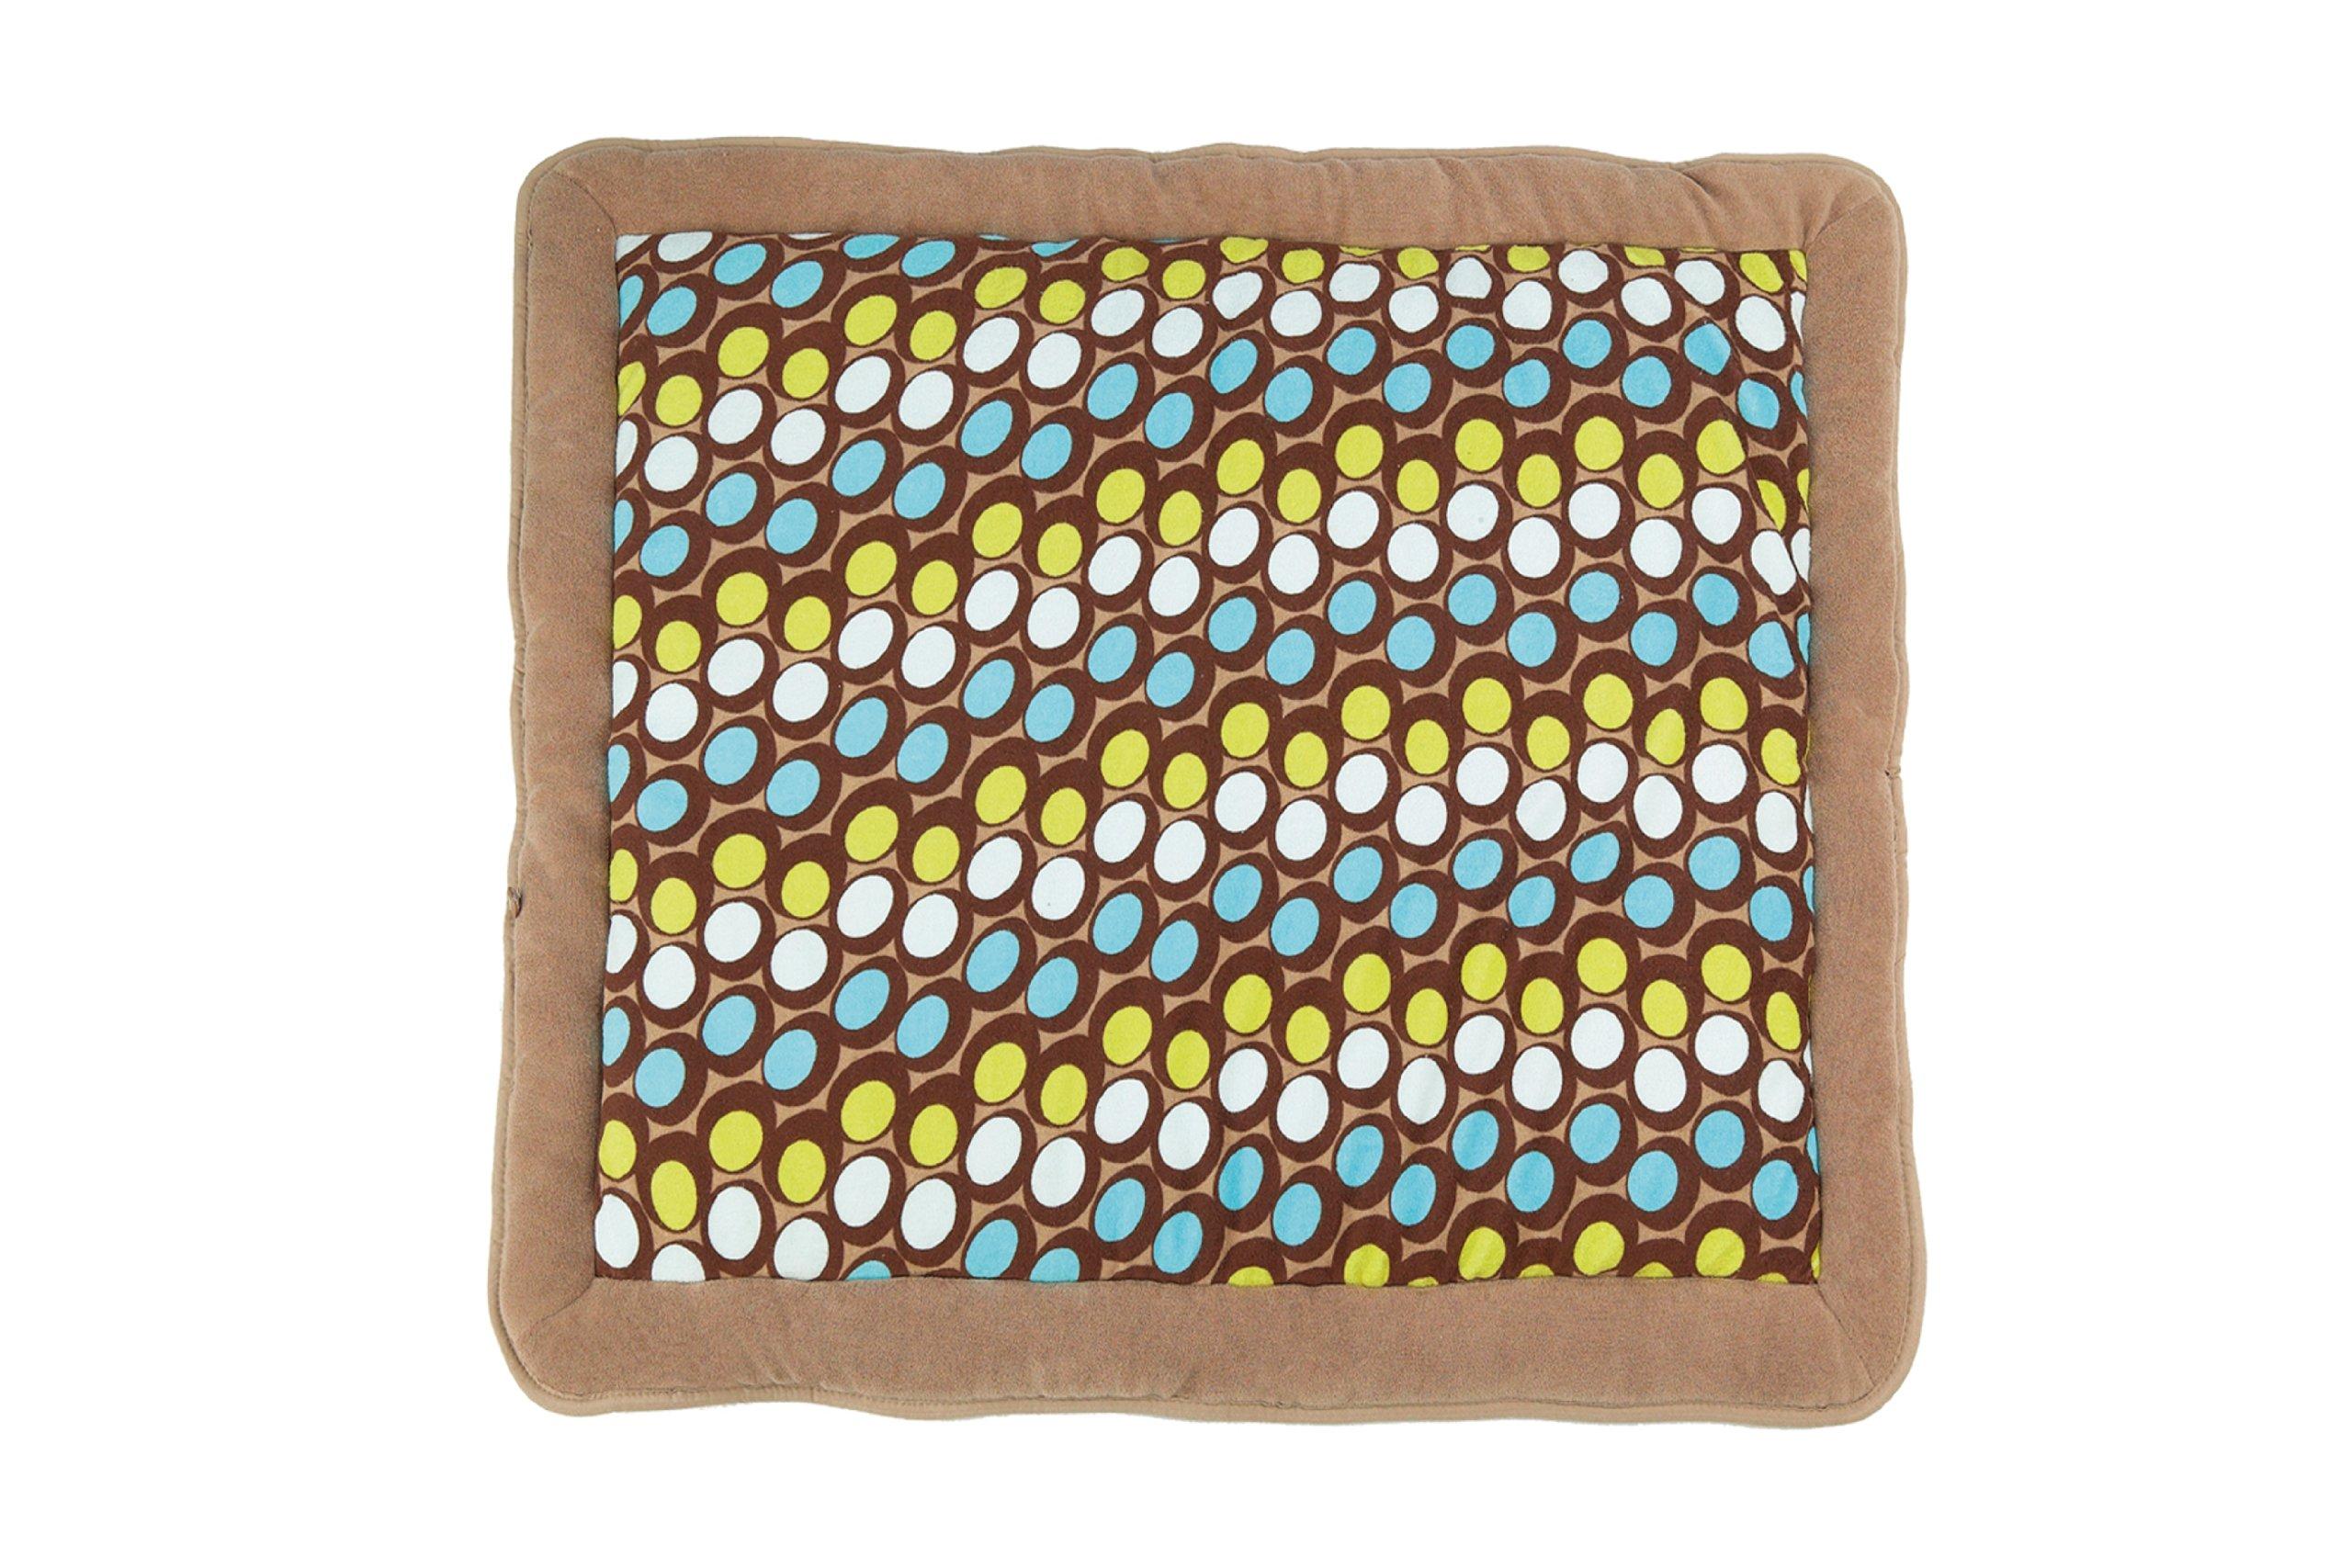 Baby Boum 100 x 100cm Padded Play Mat from The Sisko